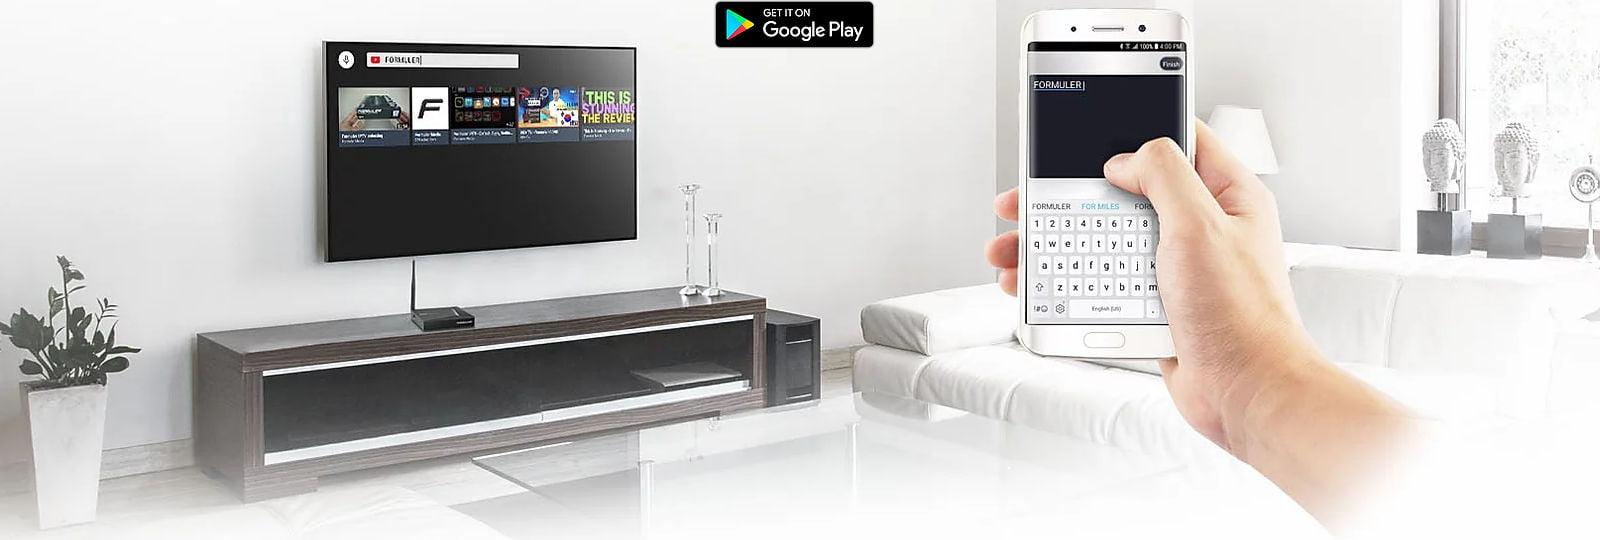 Formuler Z8 app sync Android app.